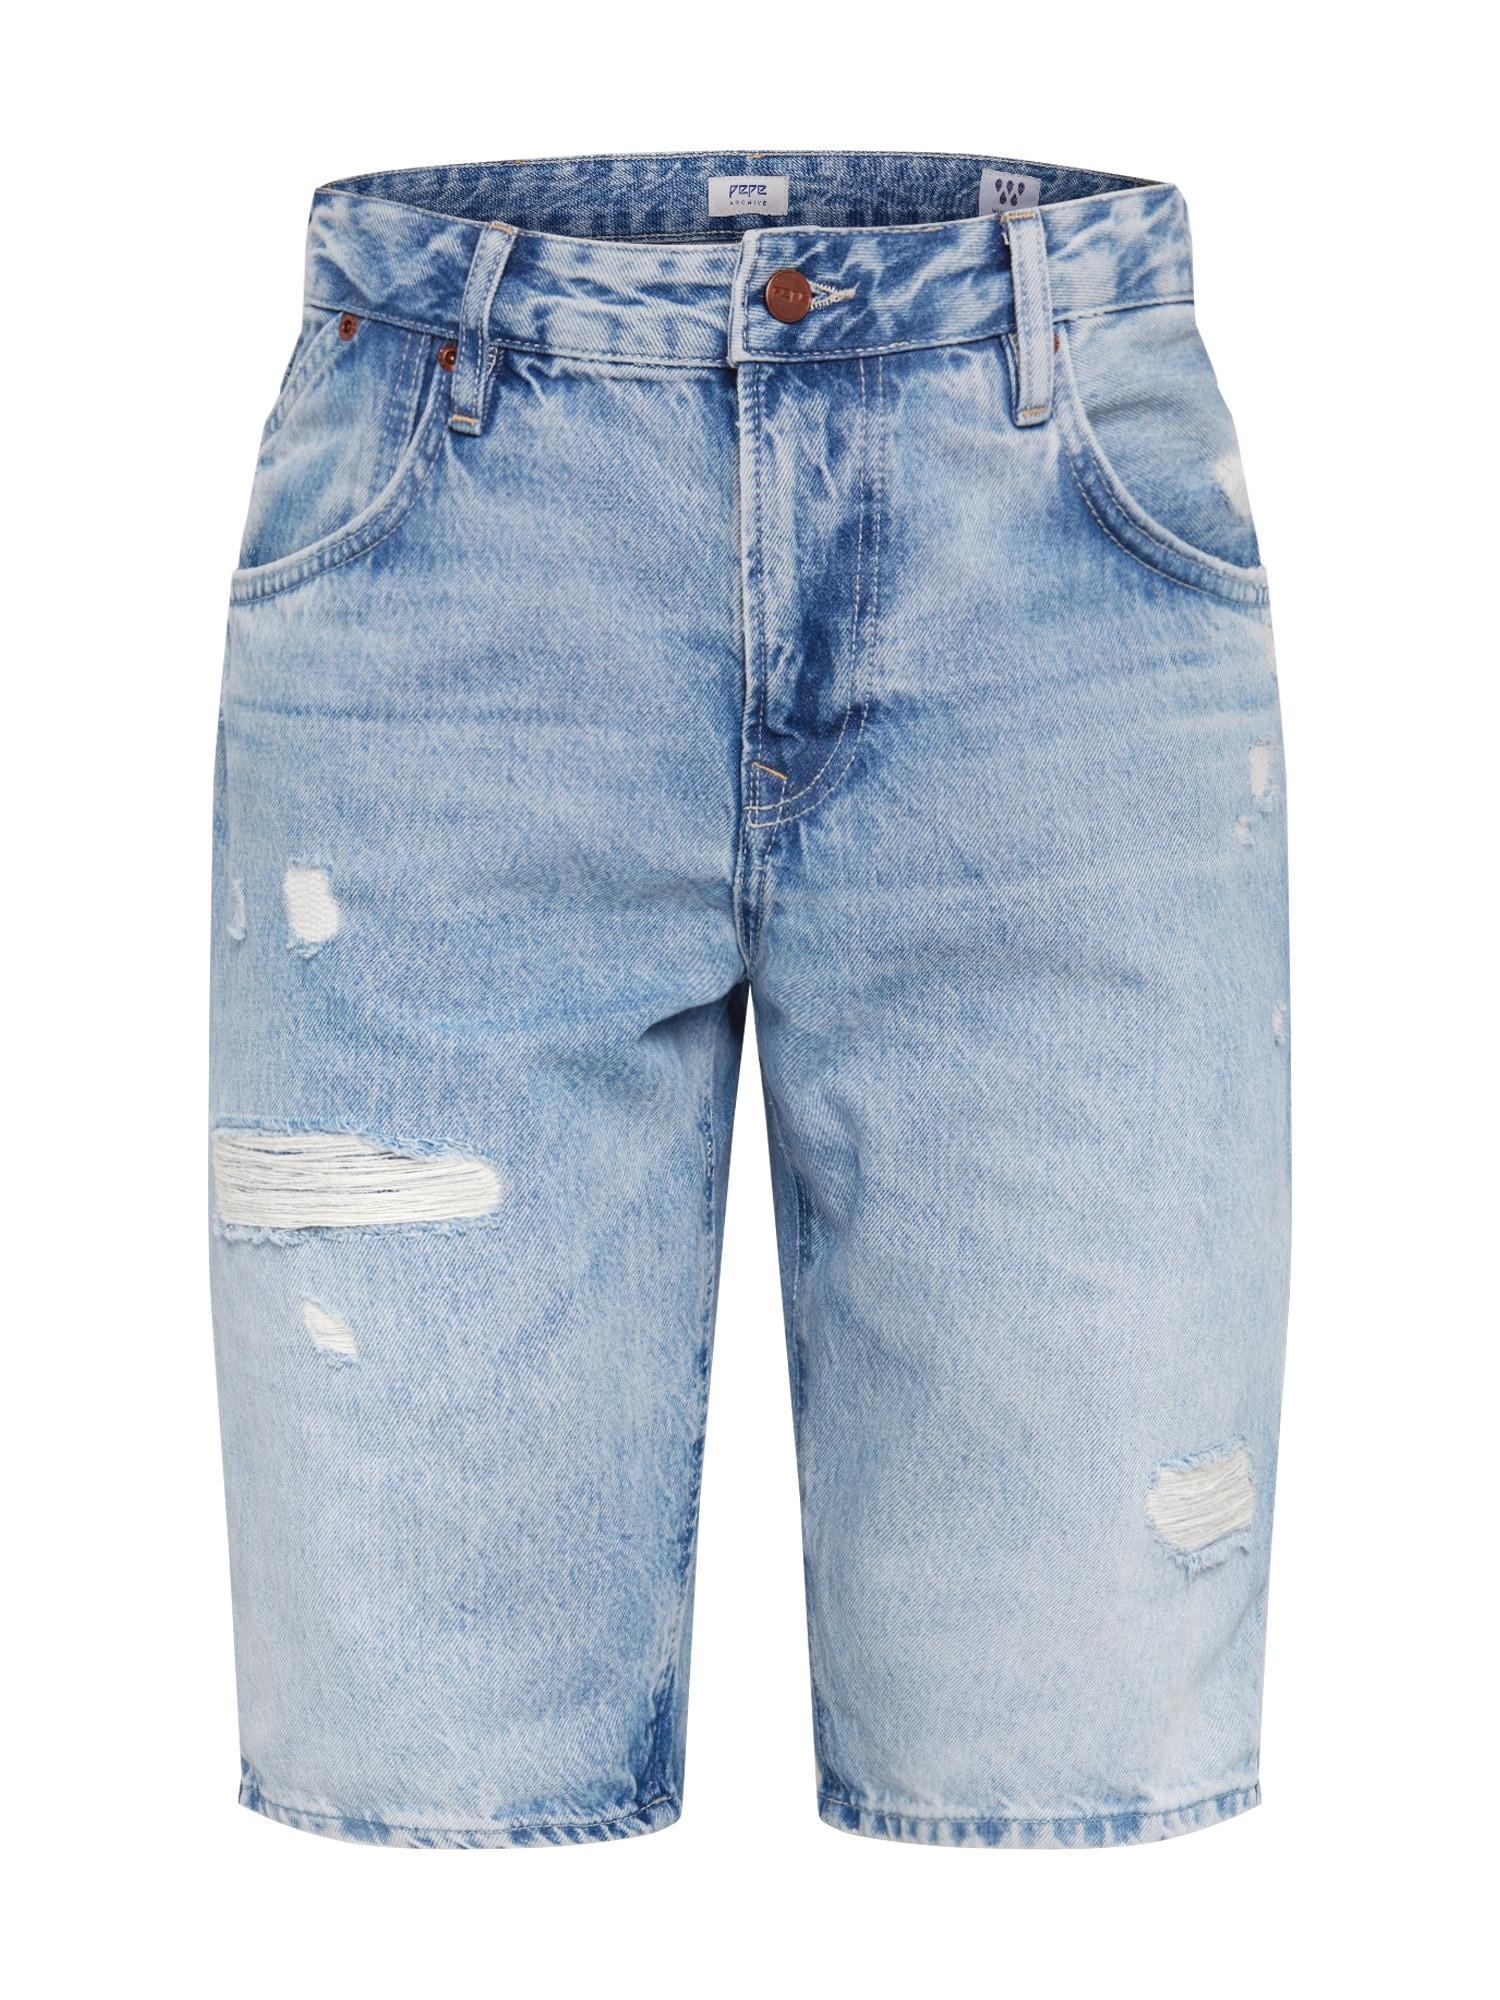 Pepe Jeans Džinsai 'JARROD SHORT ARCHIVE' tamsiai (džinso) mėlyna